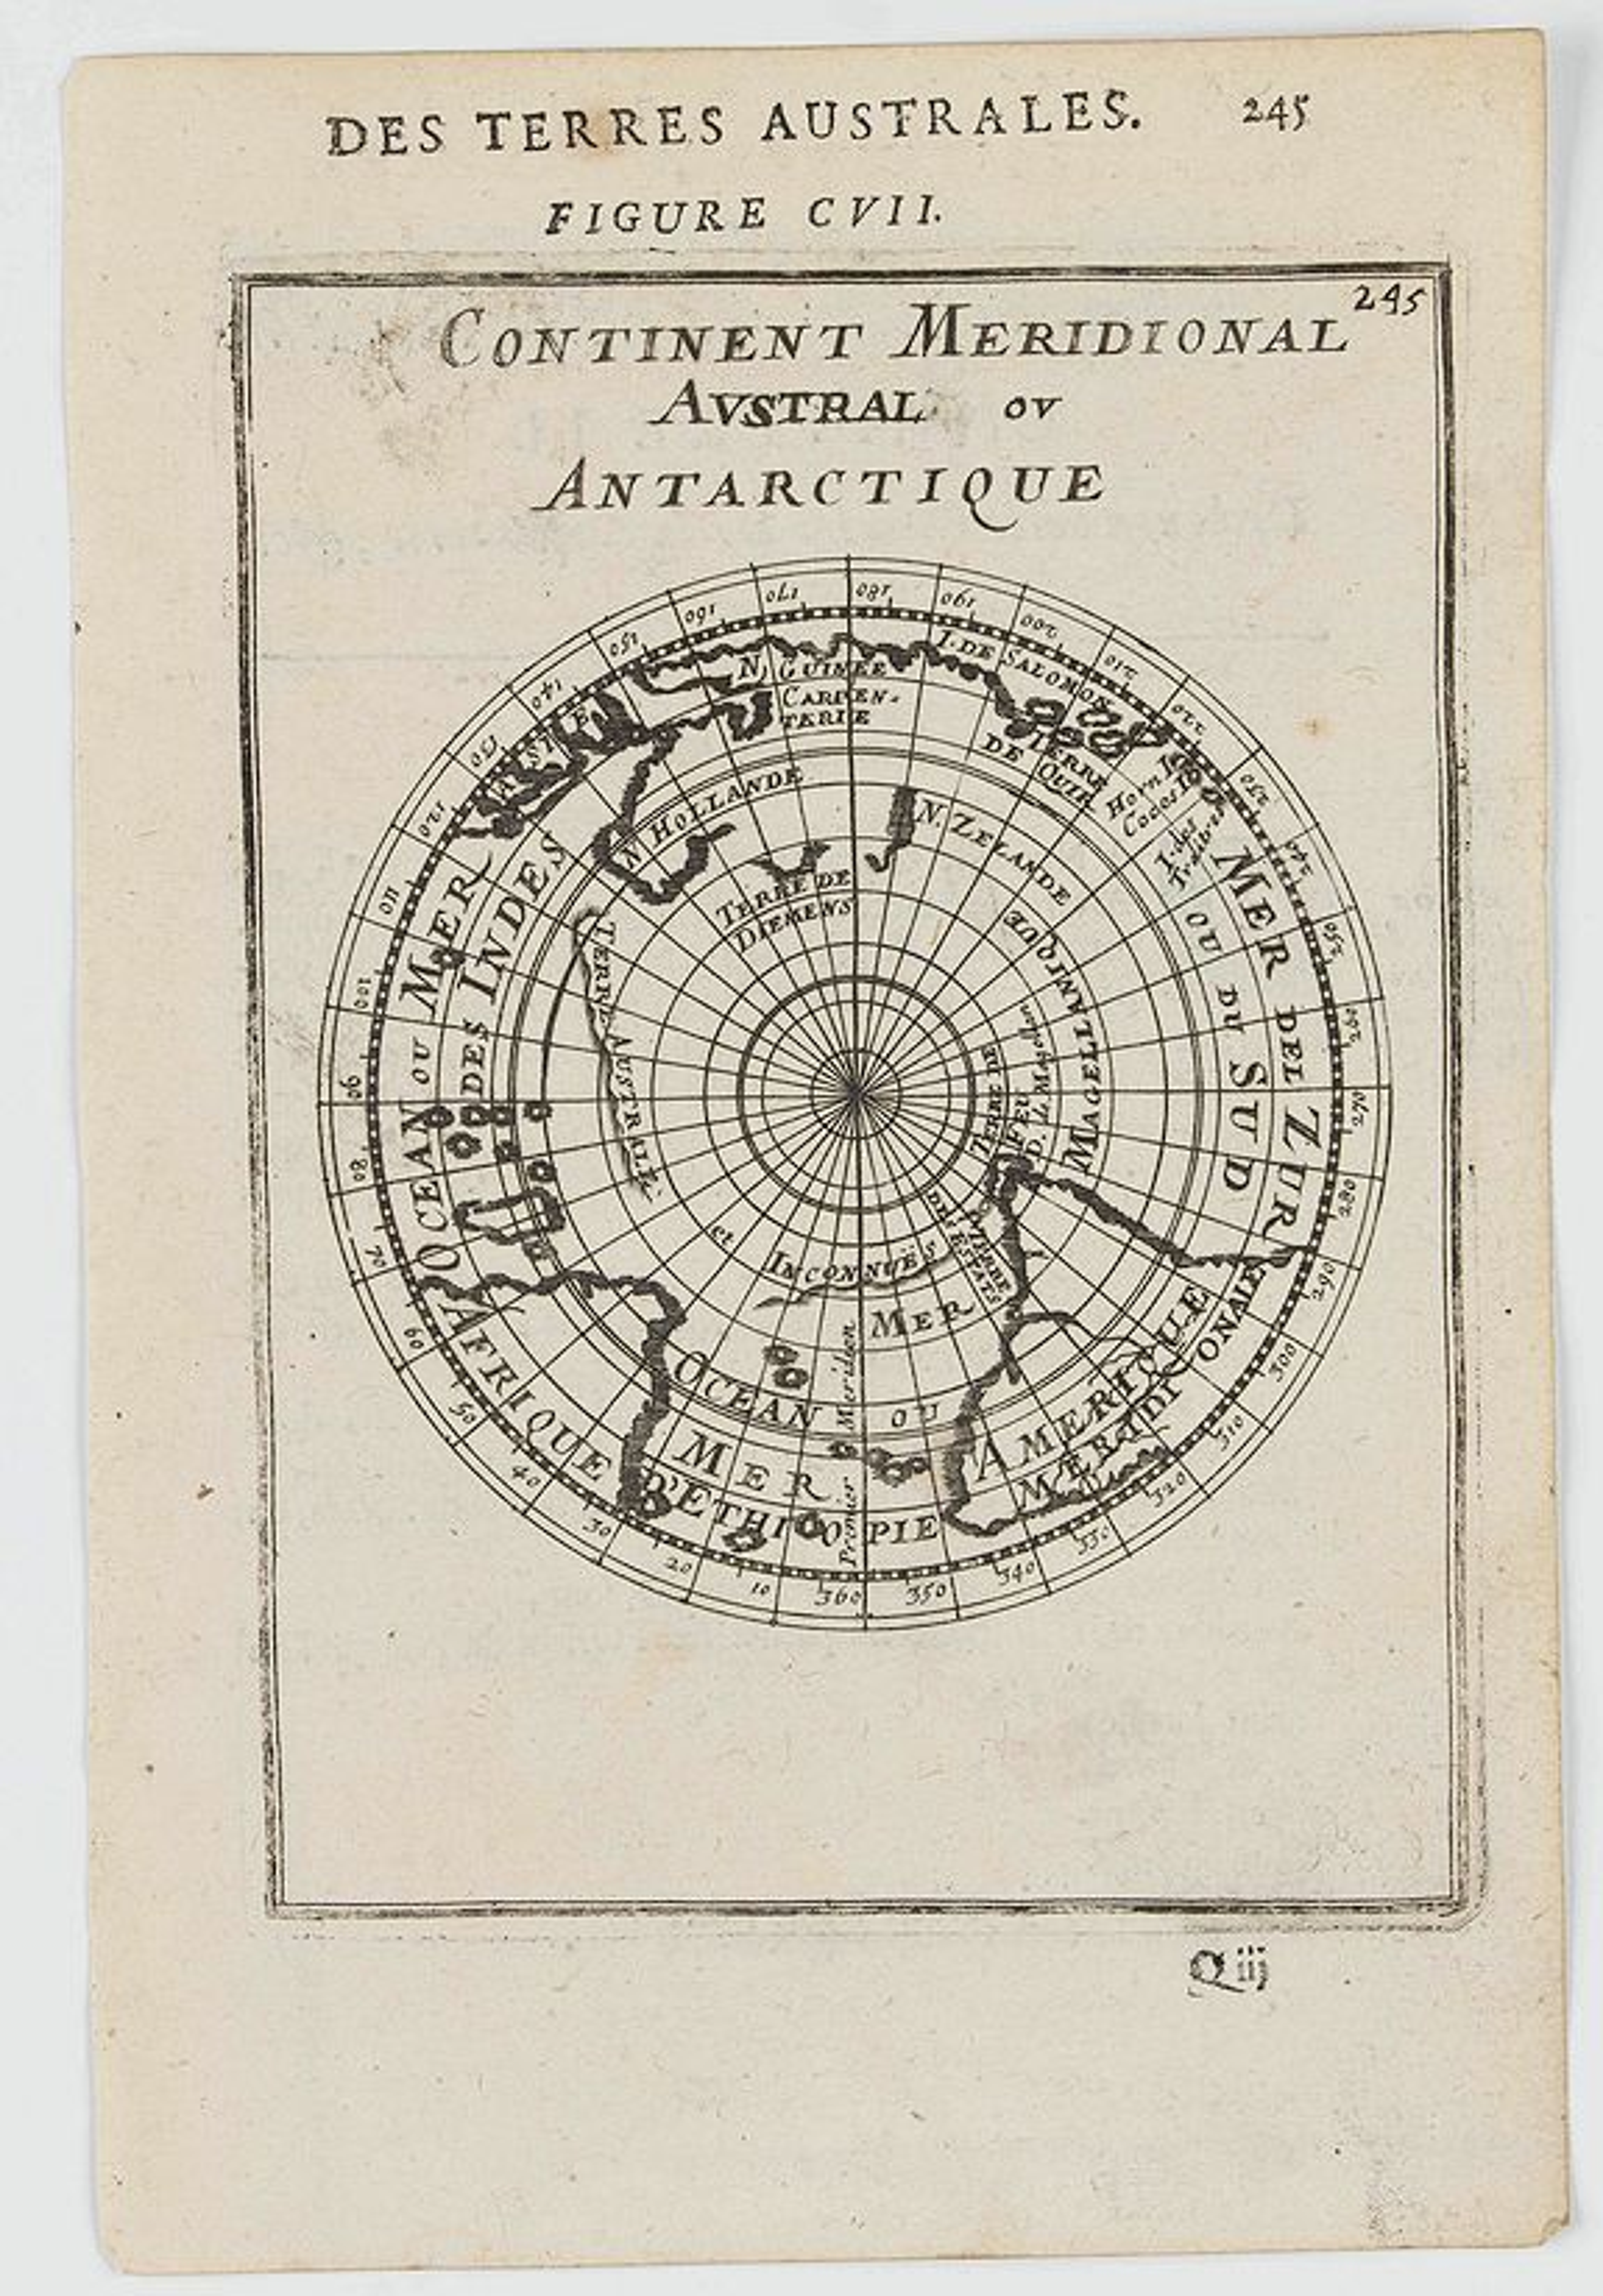 MANESSON MALLET, A. -  Continent Meridional Austral ou Antartique.